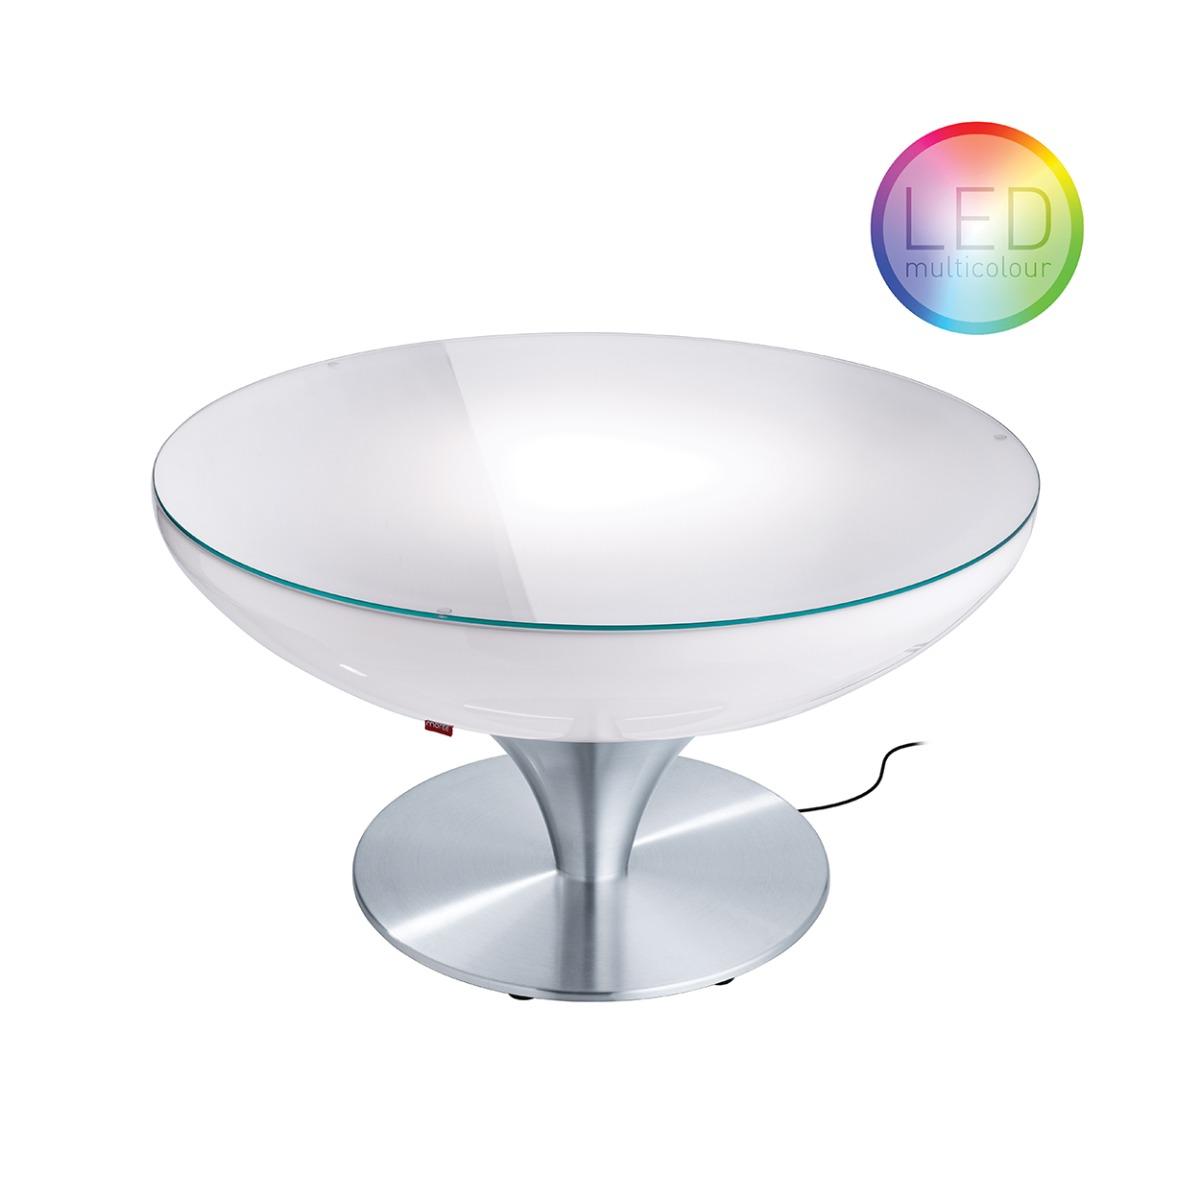 Moree – Ronde Salontafel Lounge – Hoogte 45 Cm LED Pro Outdoor – Wit | 4260218360648